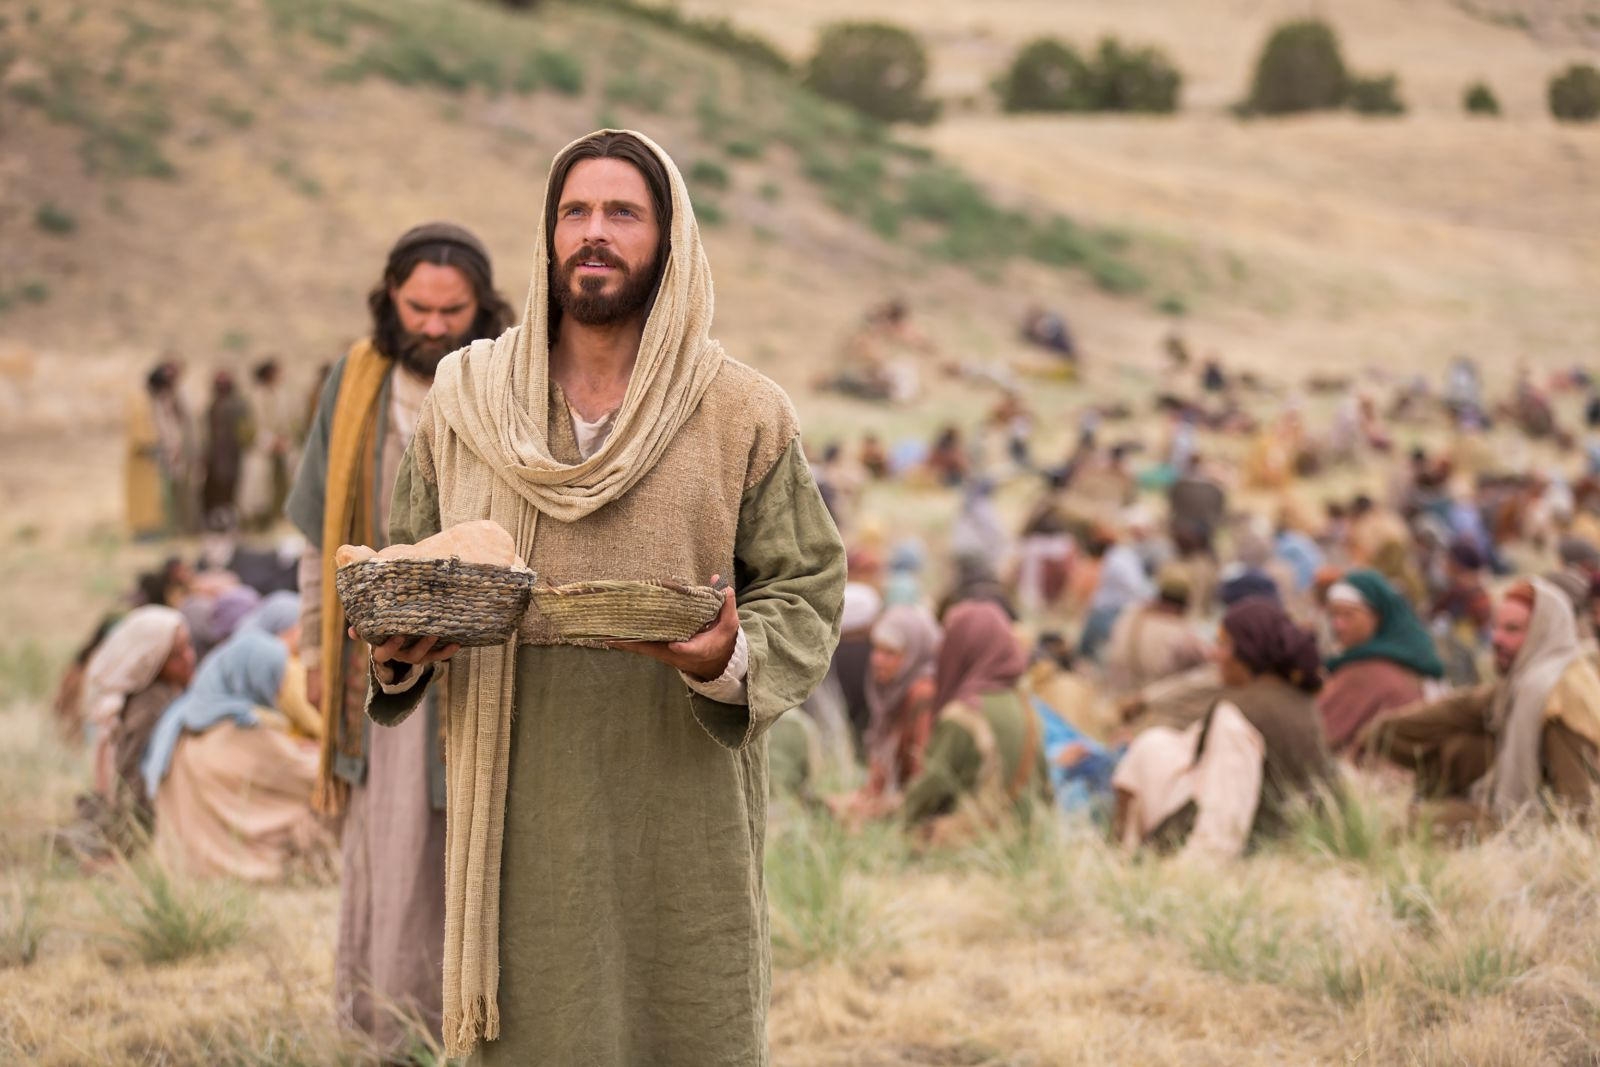 miracles_of_jesus_feeding_5000.jpeg